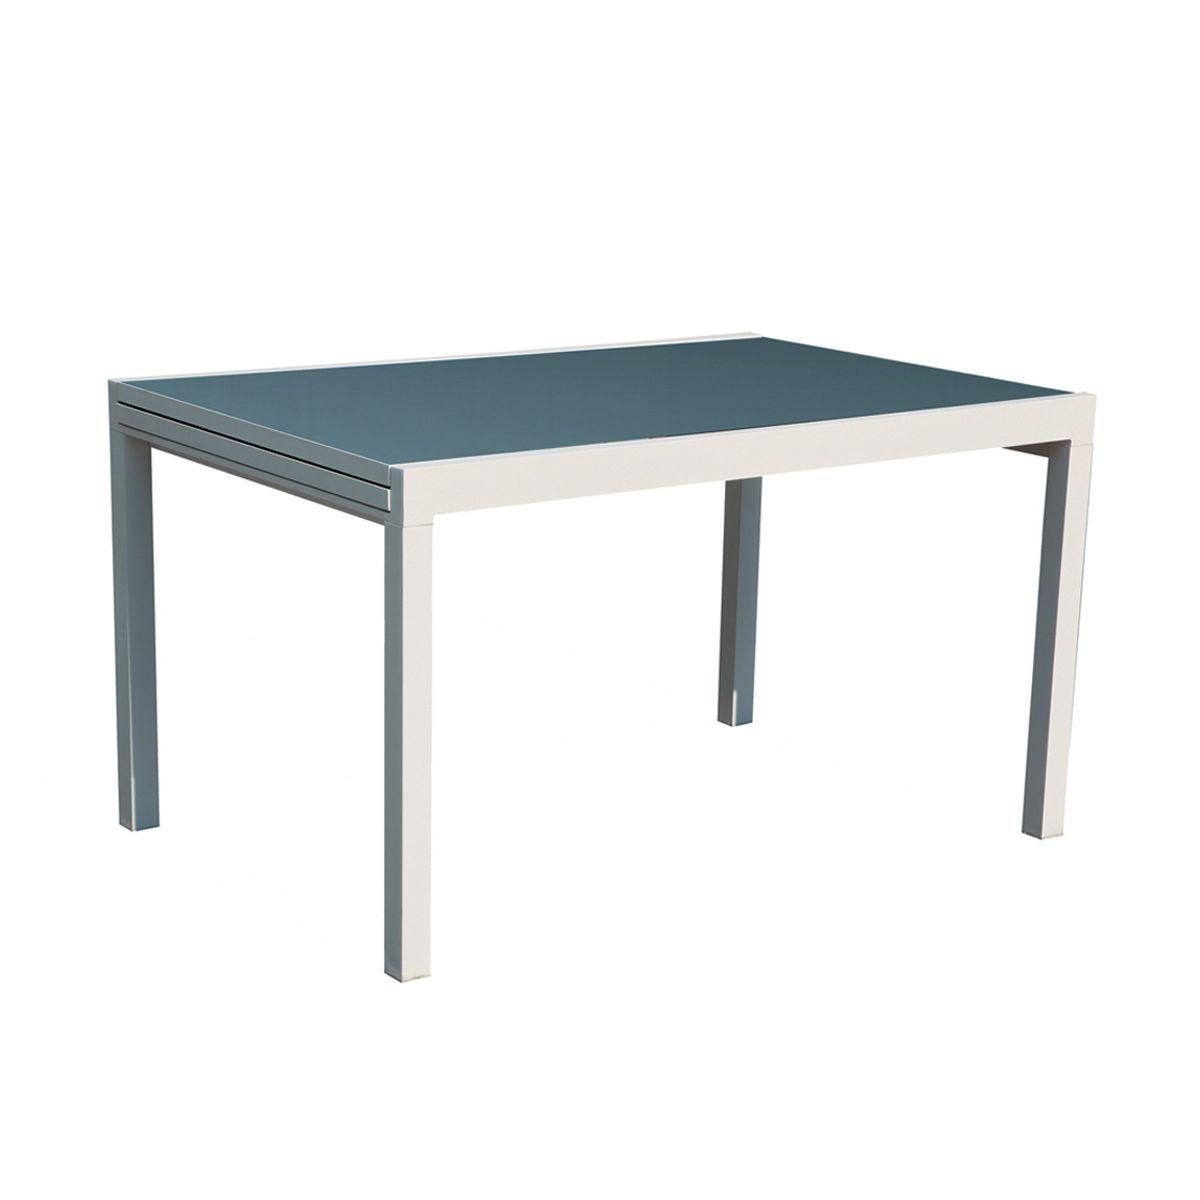 Outlet tavoli e sedie milano sedie e tavoli aeffe with for Tavolo mosaico leroy merlin